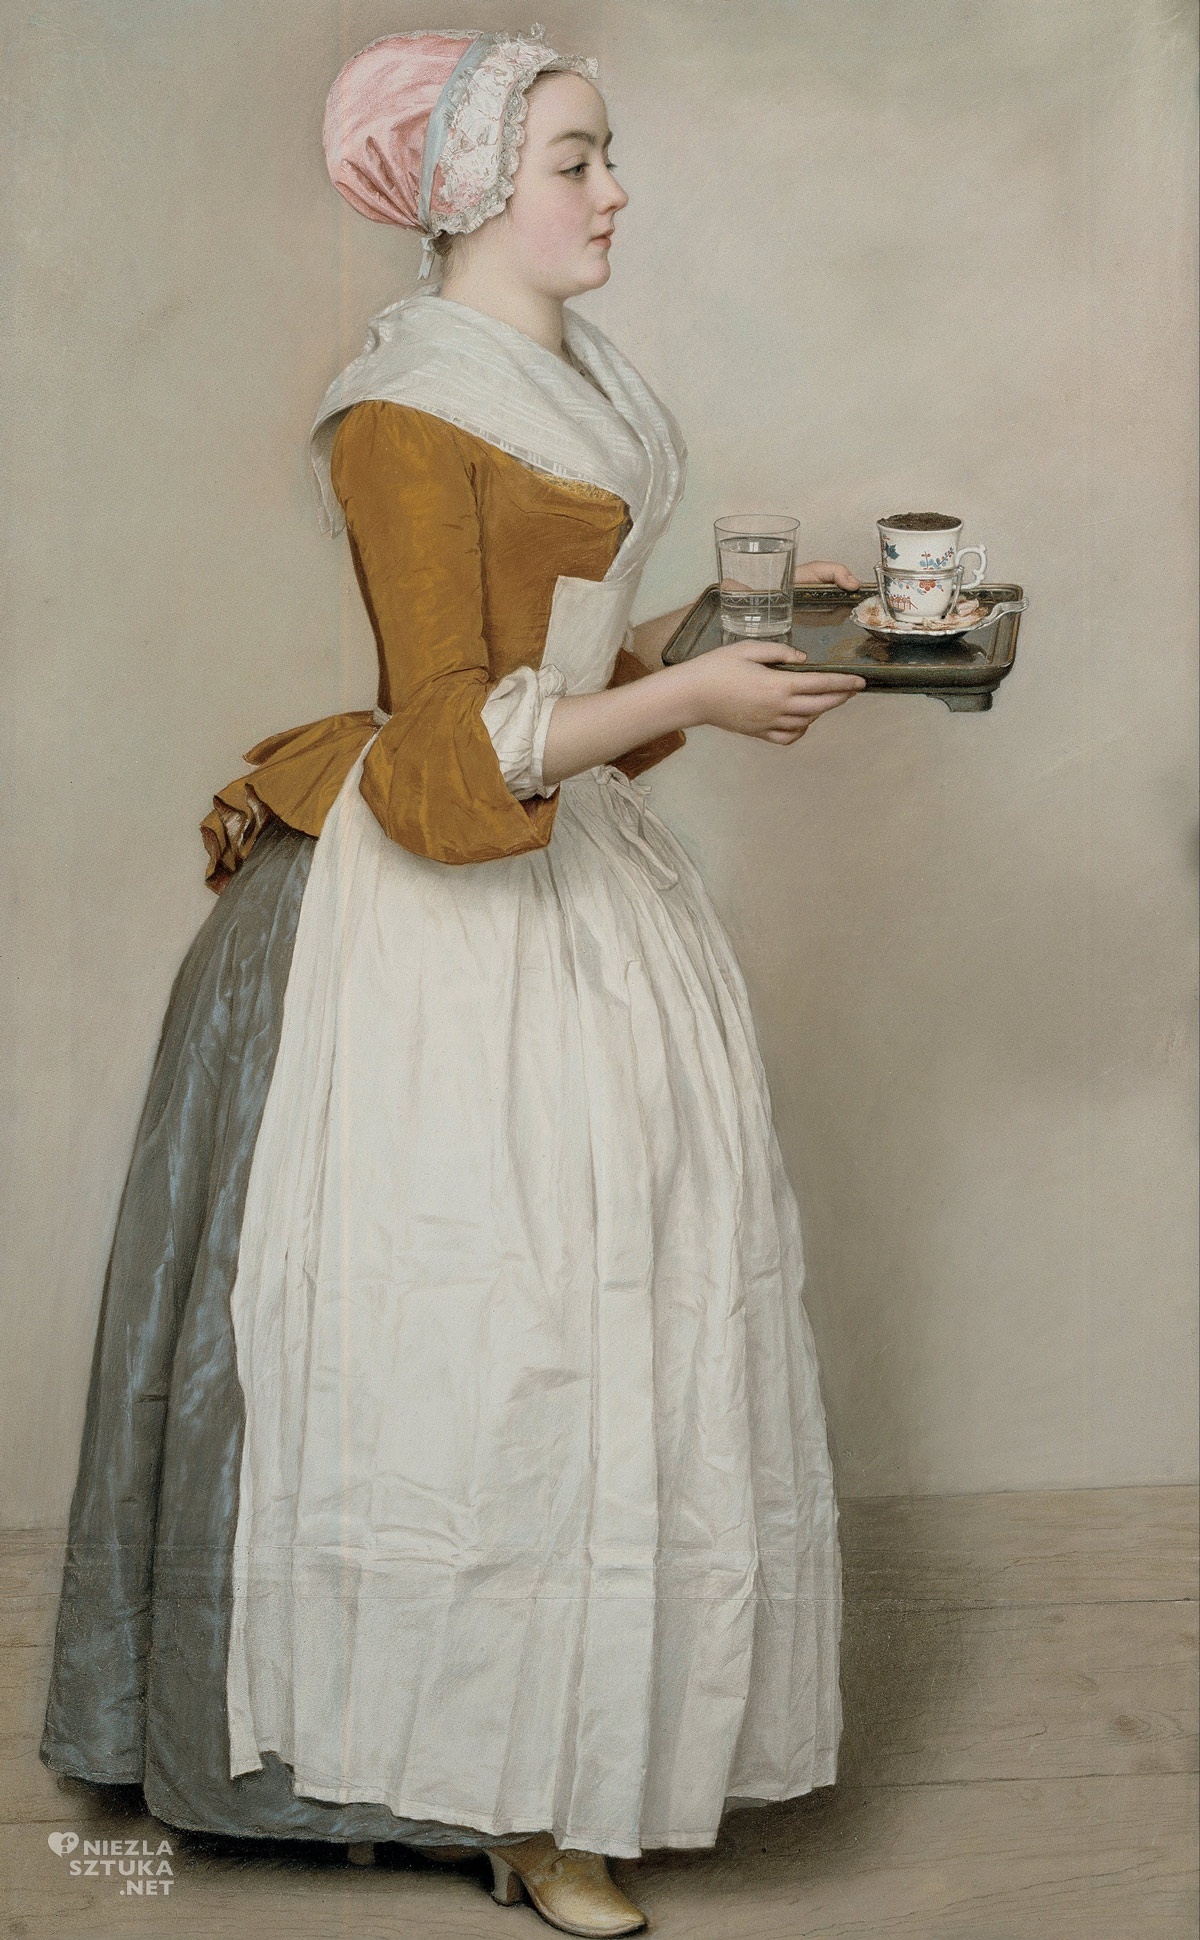 Jean-Etienne Liotard, Czekoladziarka, Gemäldegalerie Alte Meister, Drezno, Niezła sztuka